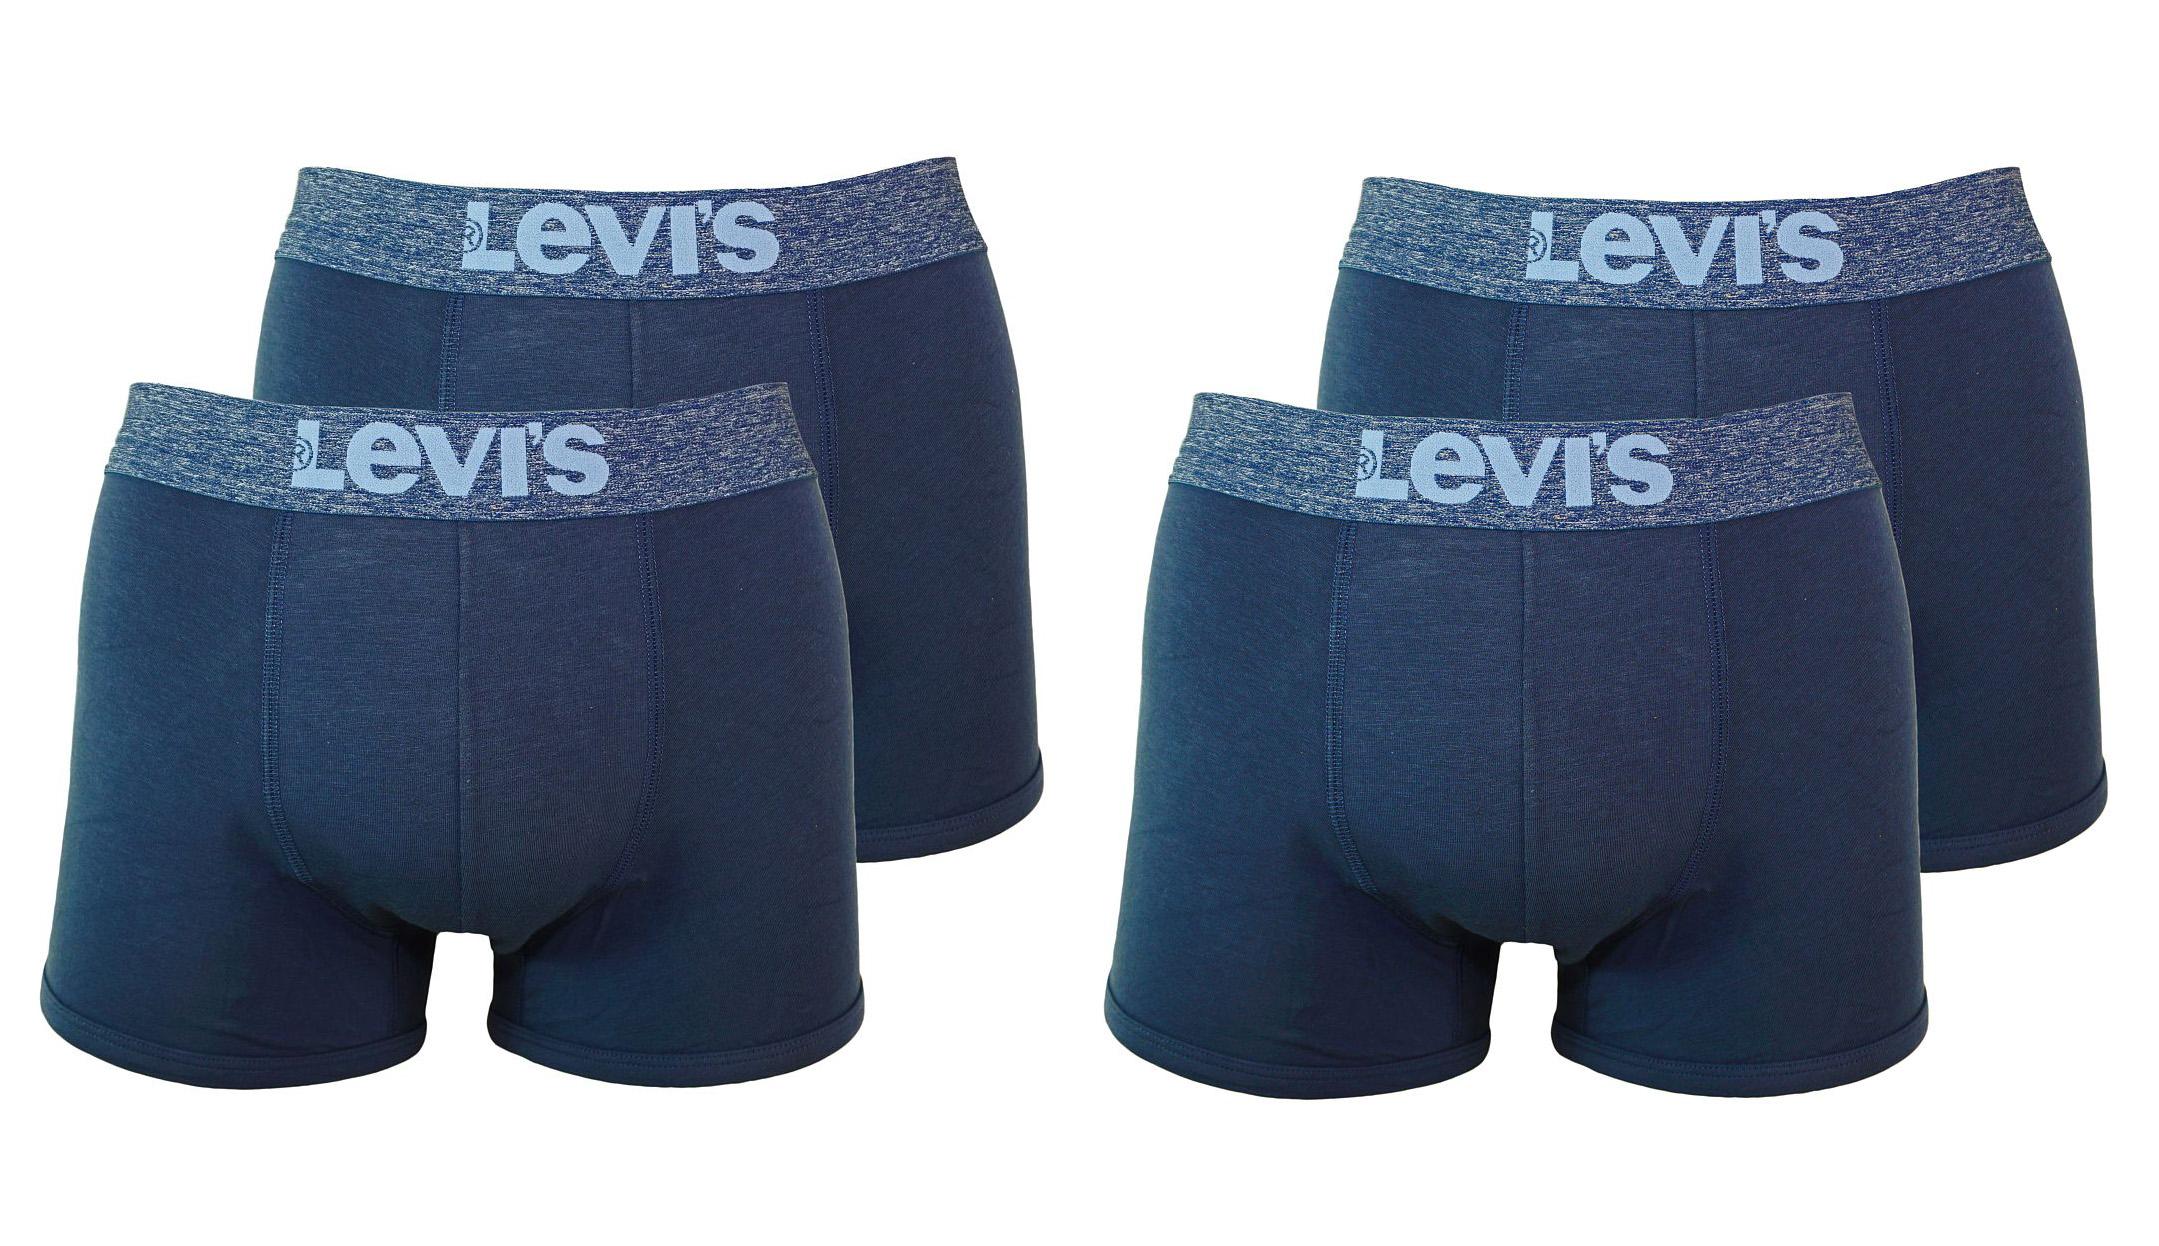 LEVIS Unterhosen 200SF 2 x 2er Pack Trunk 951008001 824 mid denim SF17-LVS2